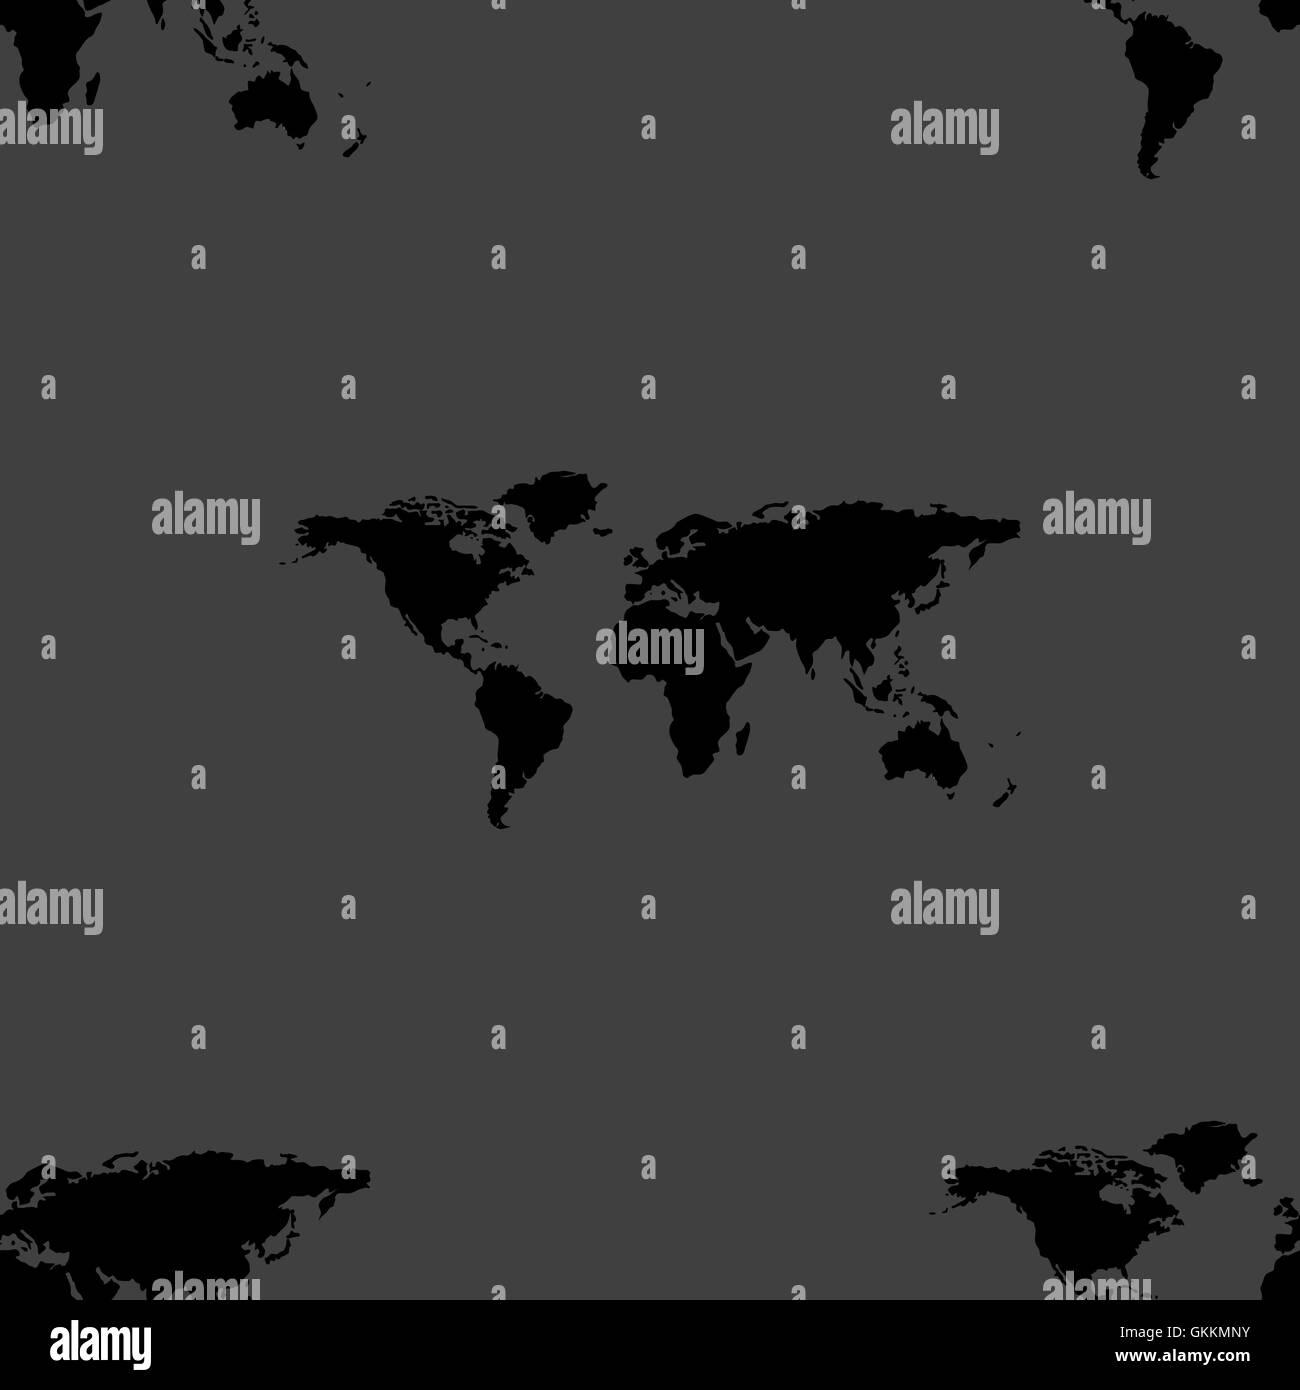 World map web icon. flat design. Seamless gray pattern. - Stock Vector